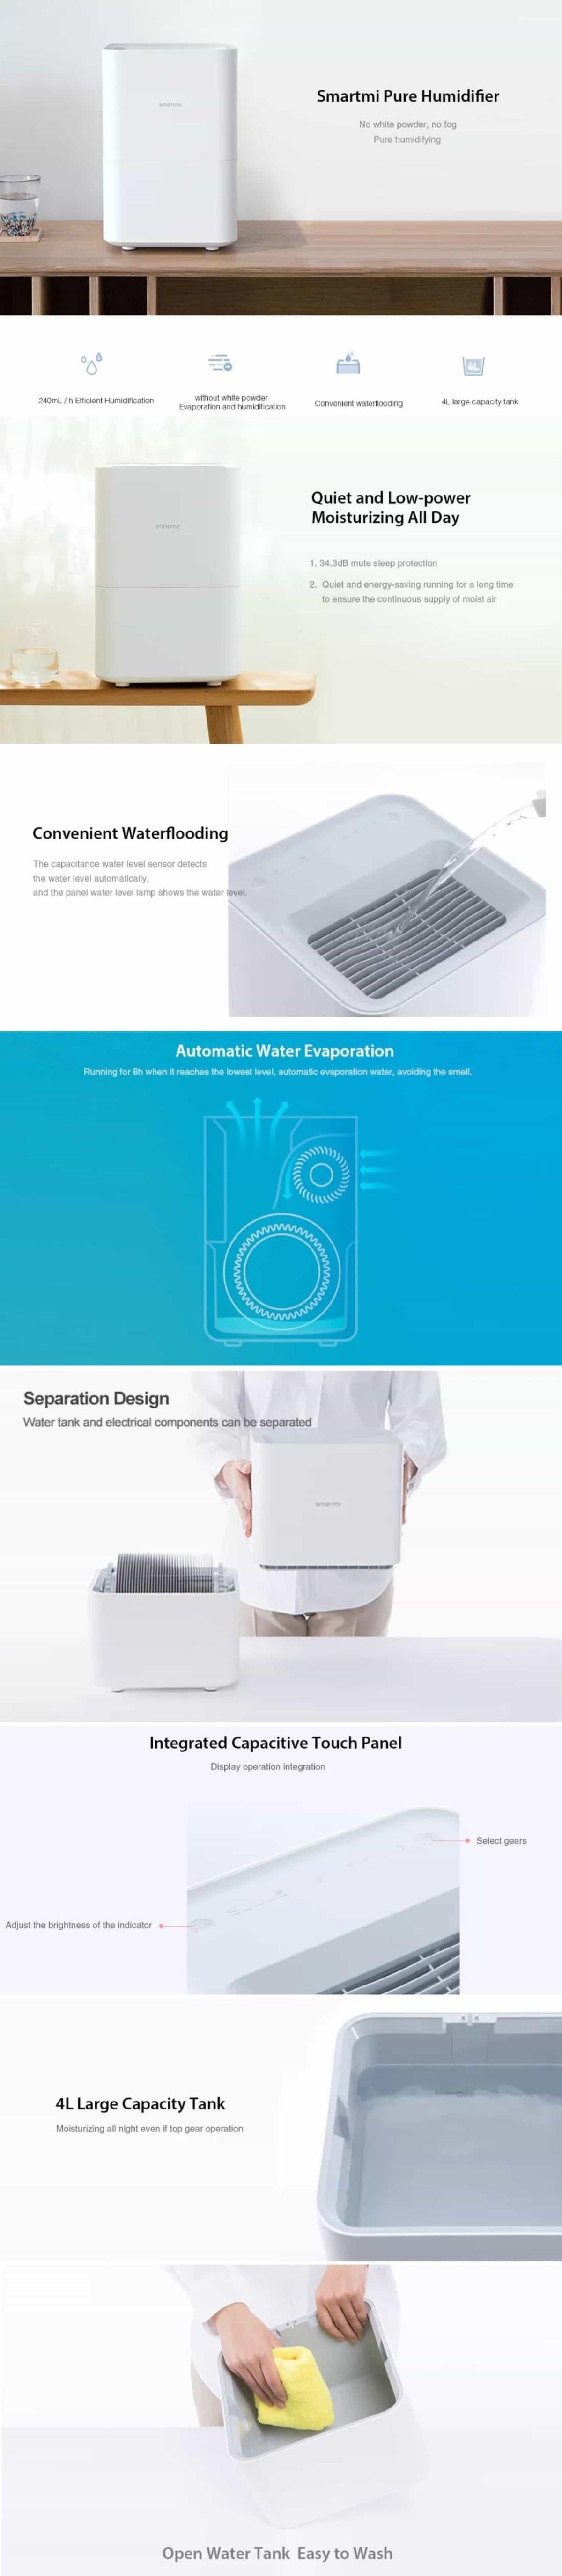 Xiaomi-Smartmi-Pure-Humidifierf2fb858353c55434.jpg